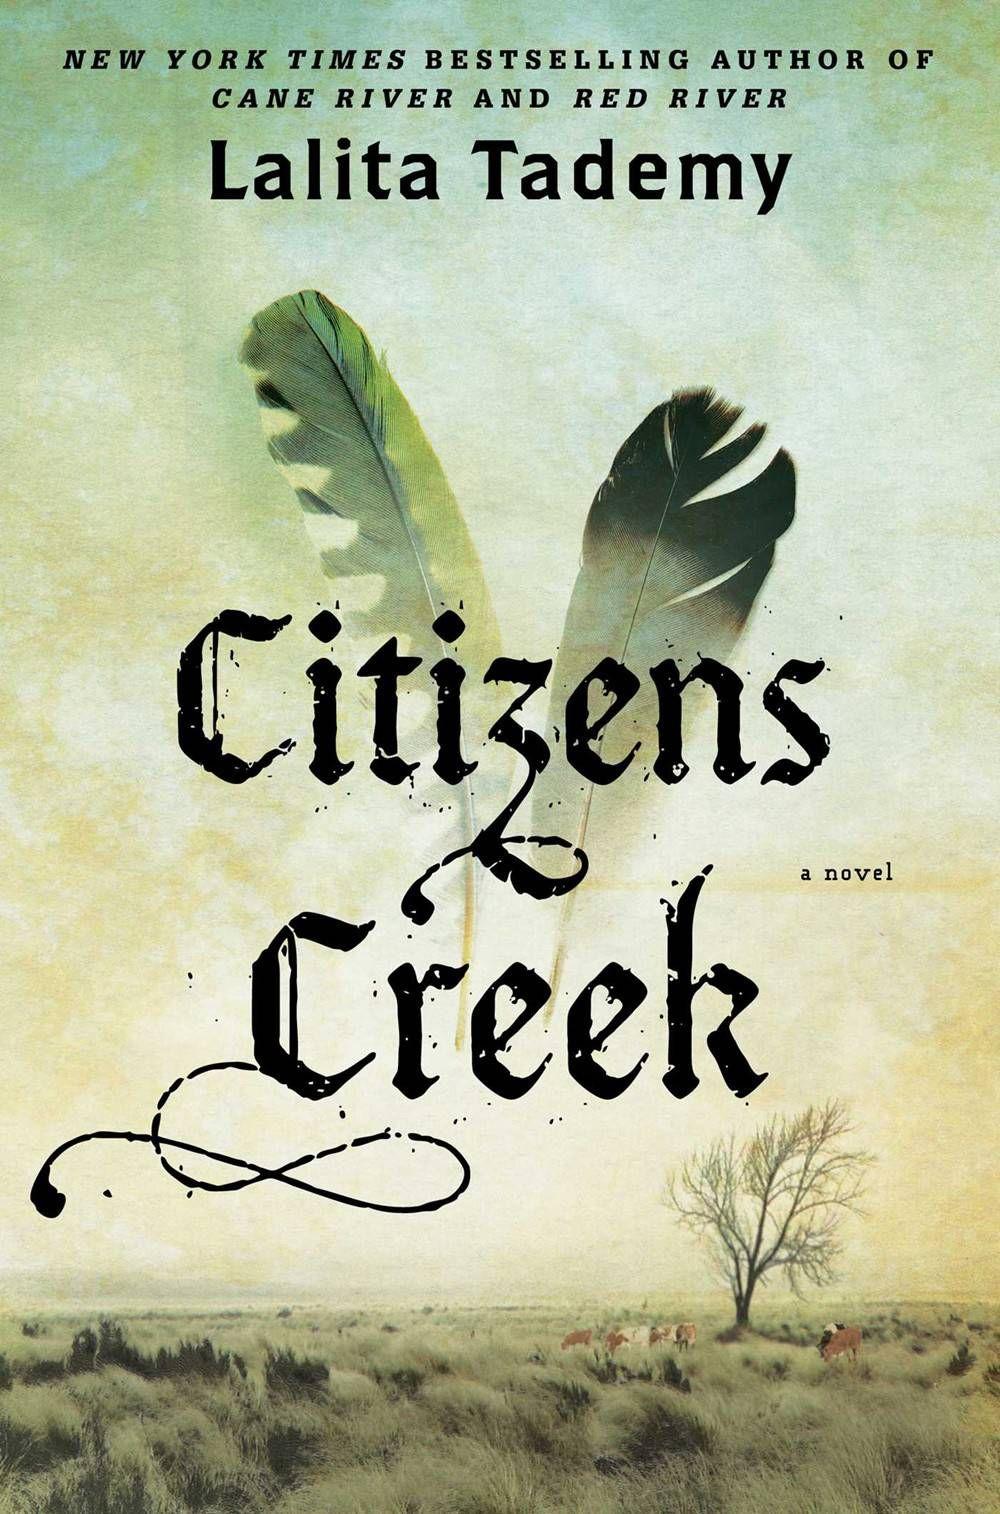 citizens creek - lalita tademy